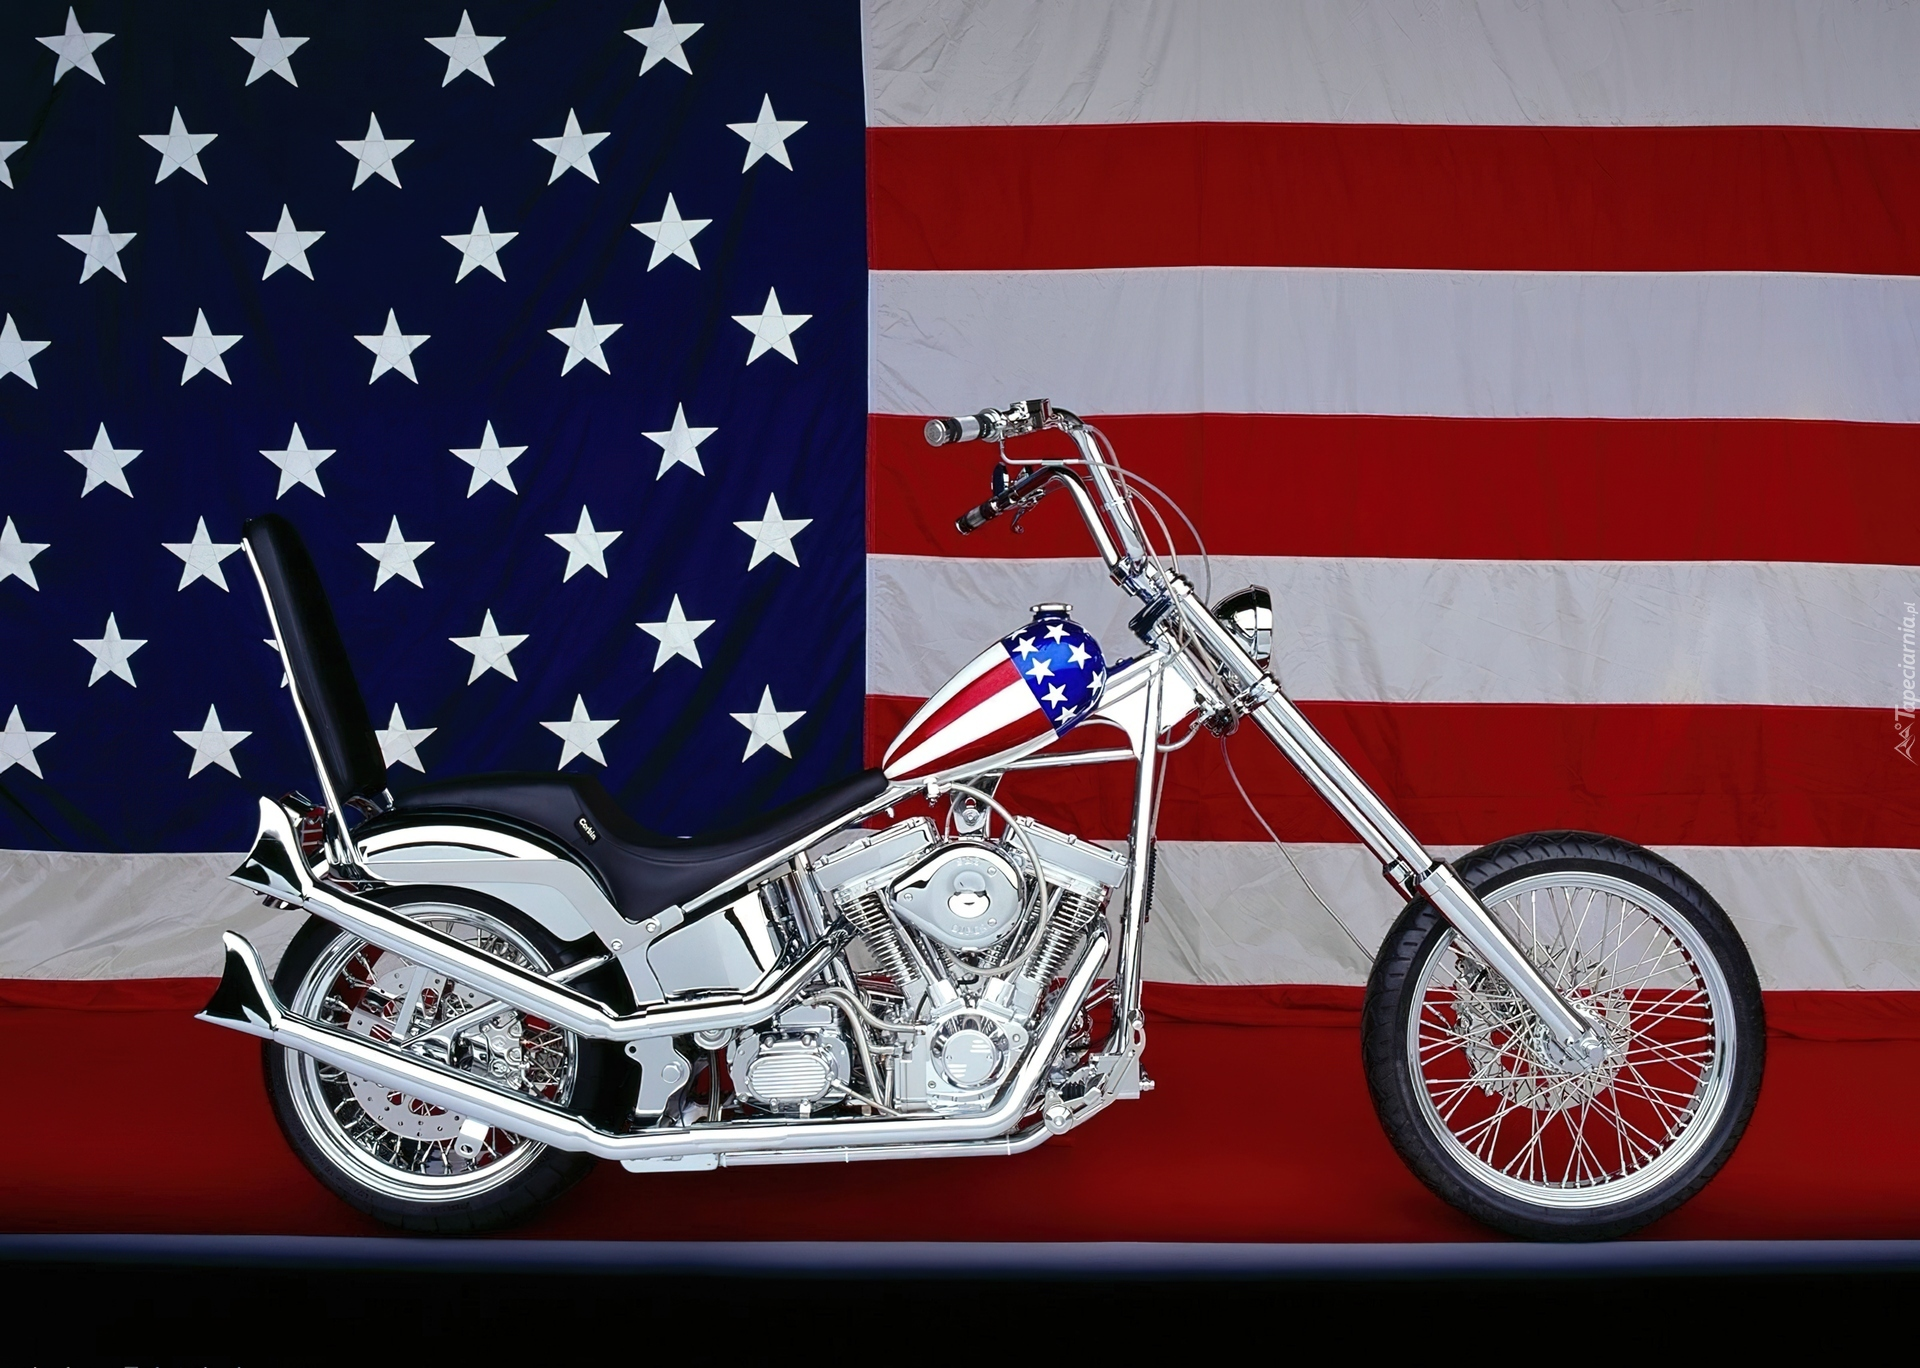 Srebrny Motocykl Flaga Usa